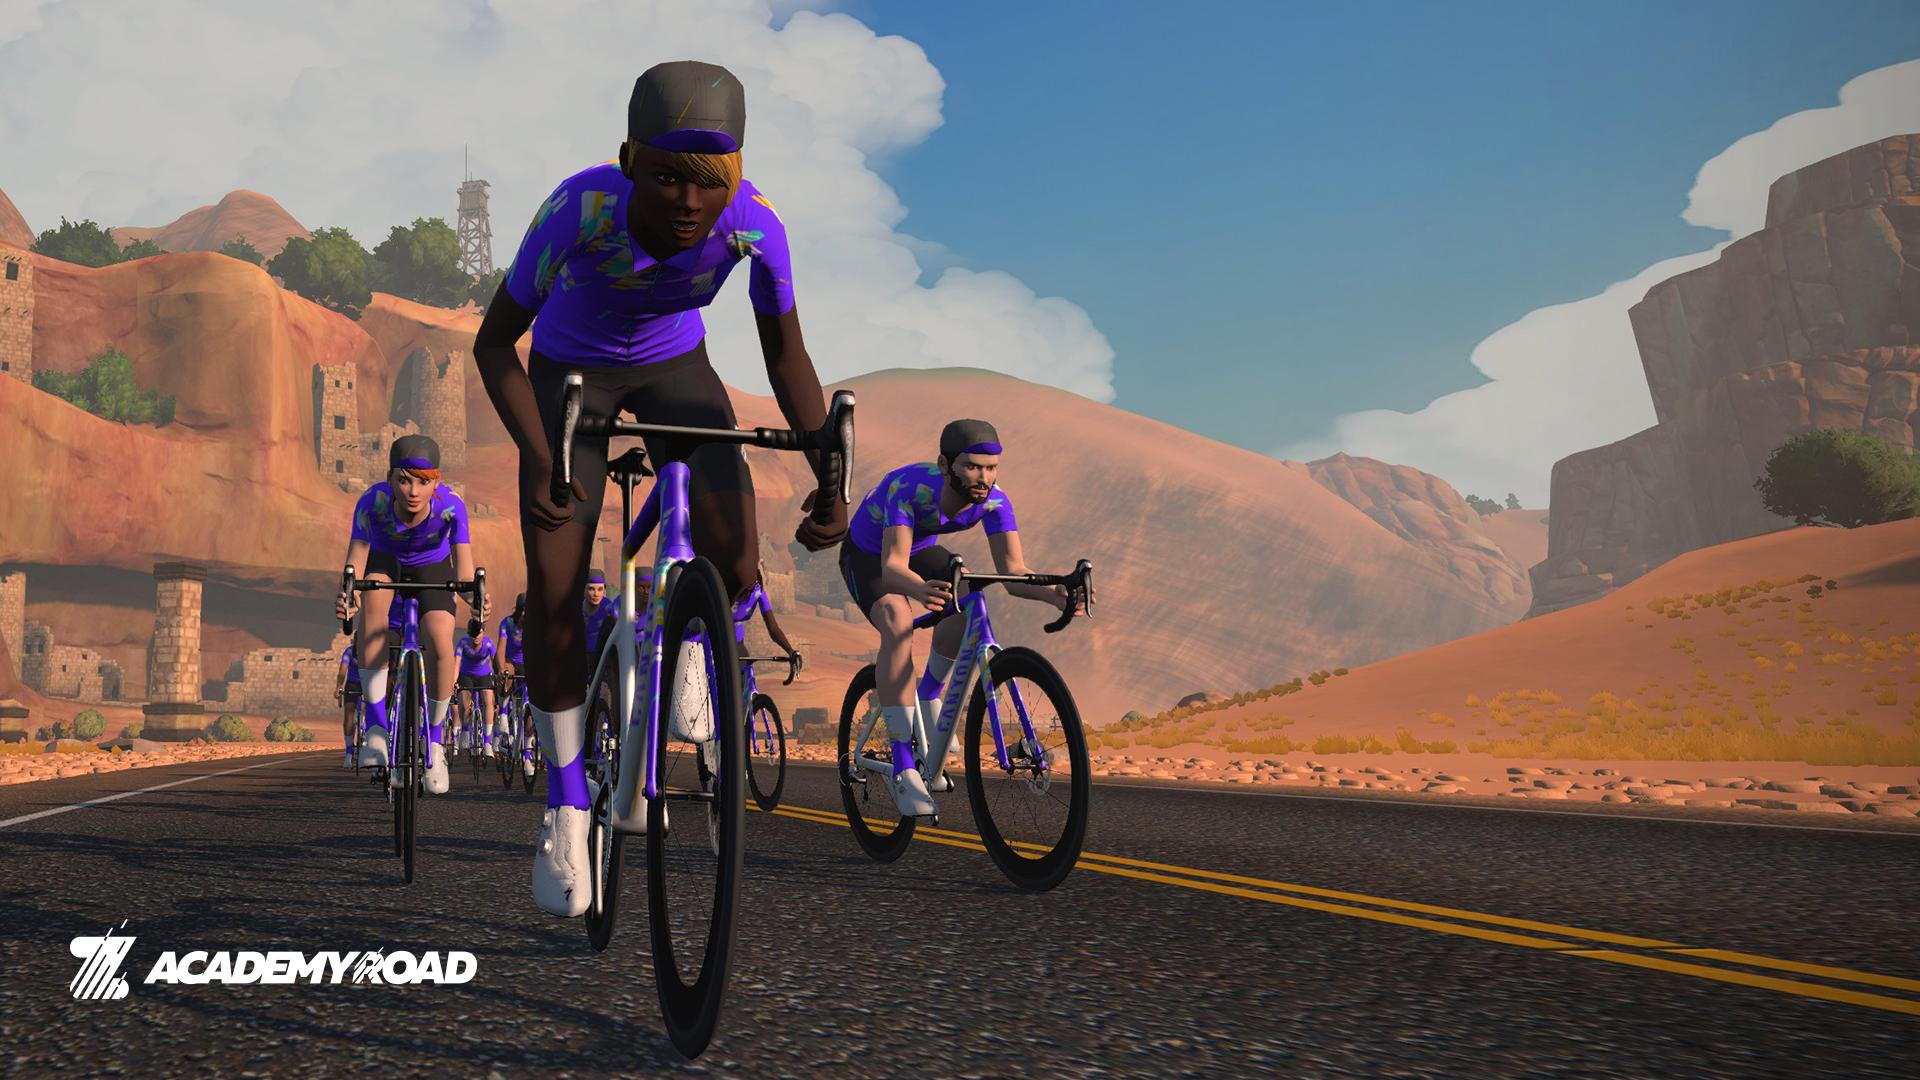 ZARoad_2021_PR_Group_Ride.jpg